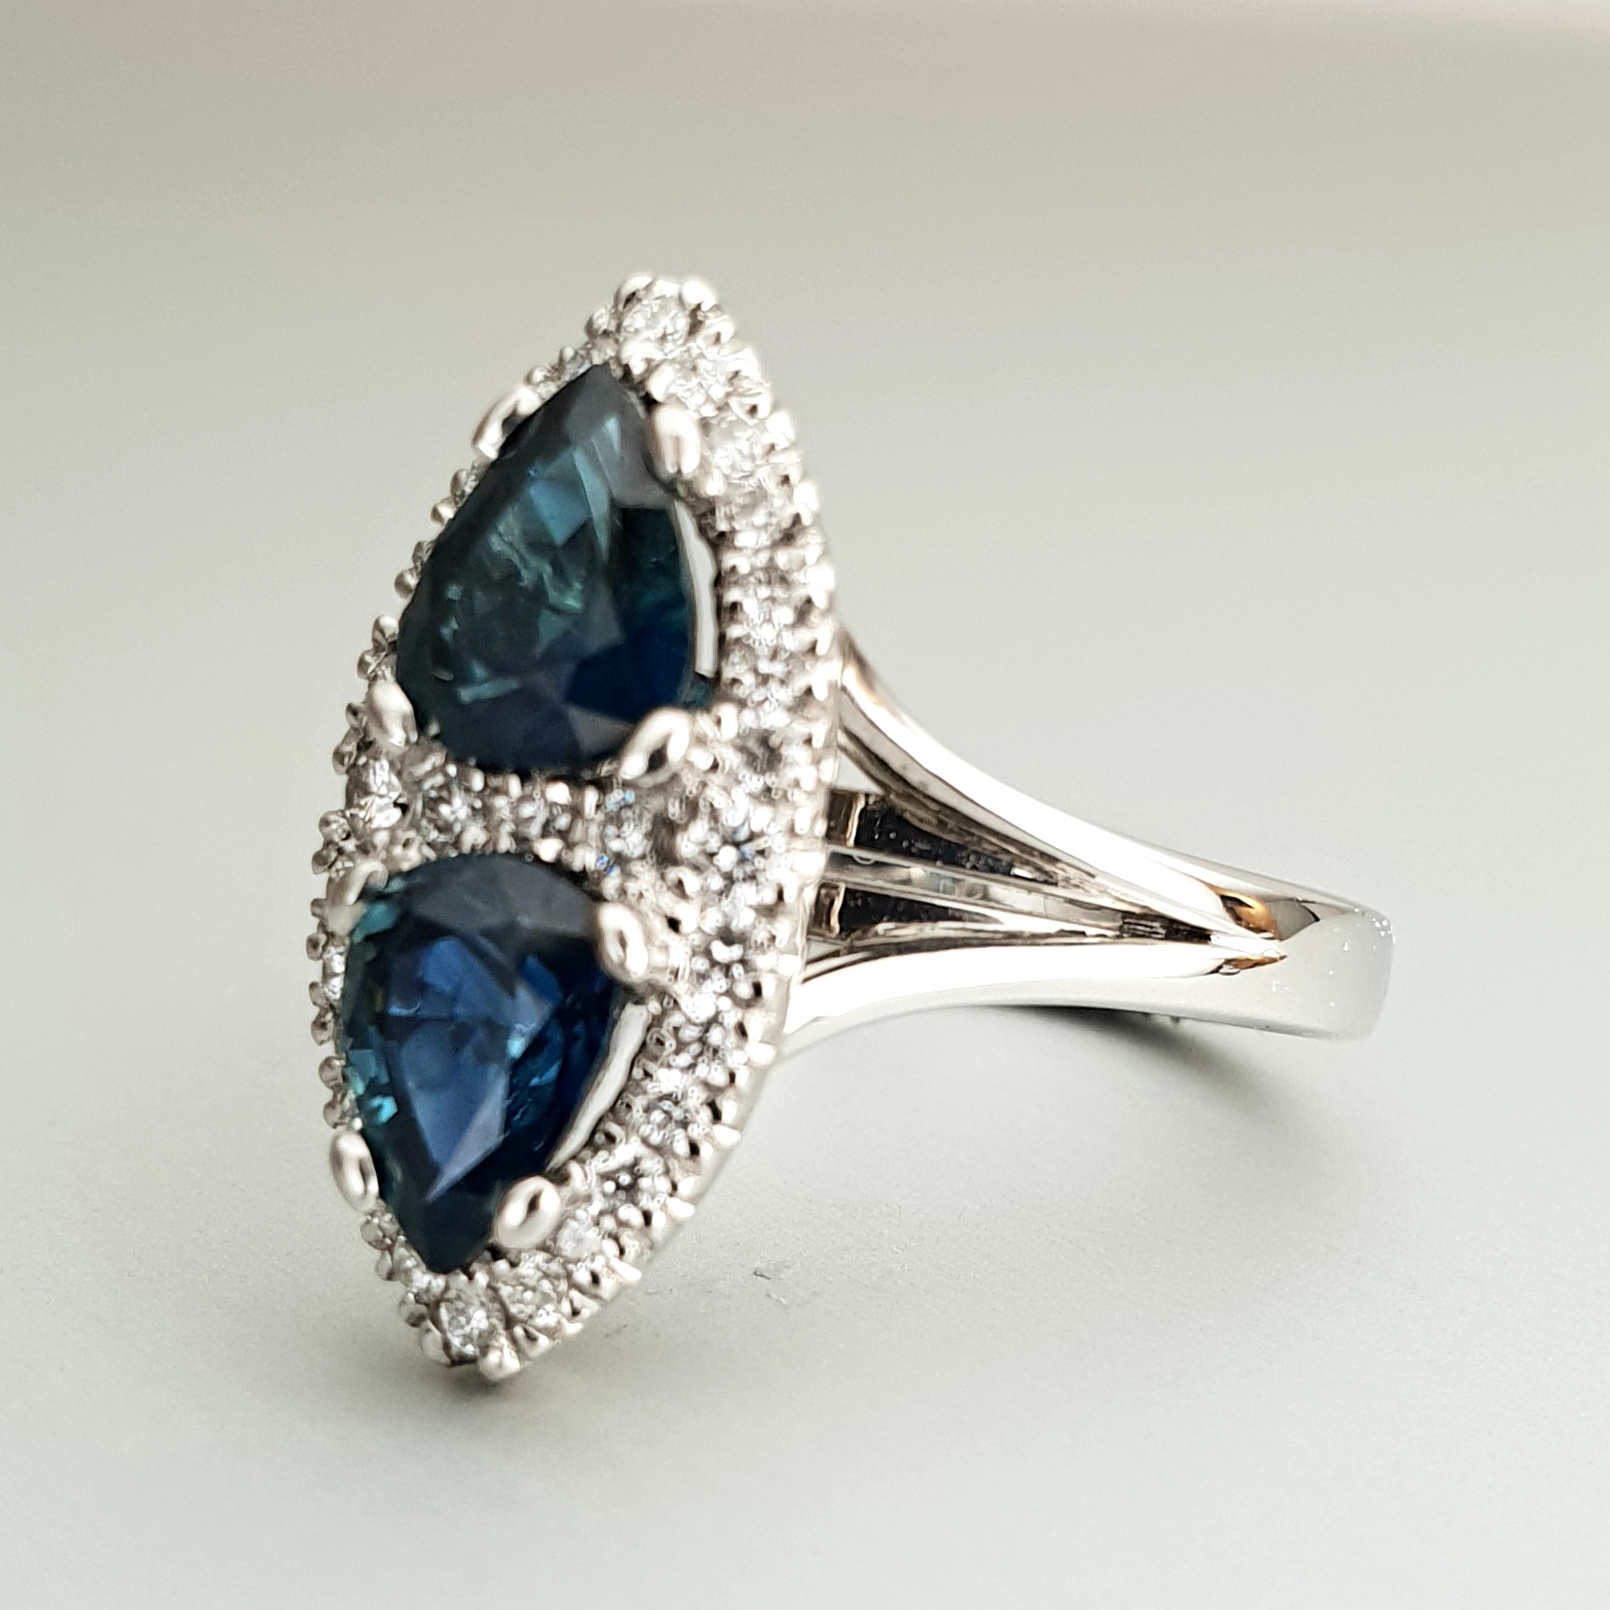 'Valentin' Sapphire and Diamond Ring in Platinum